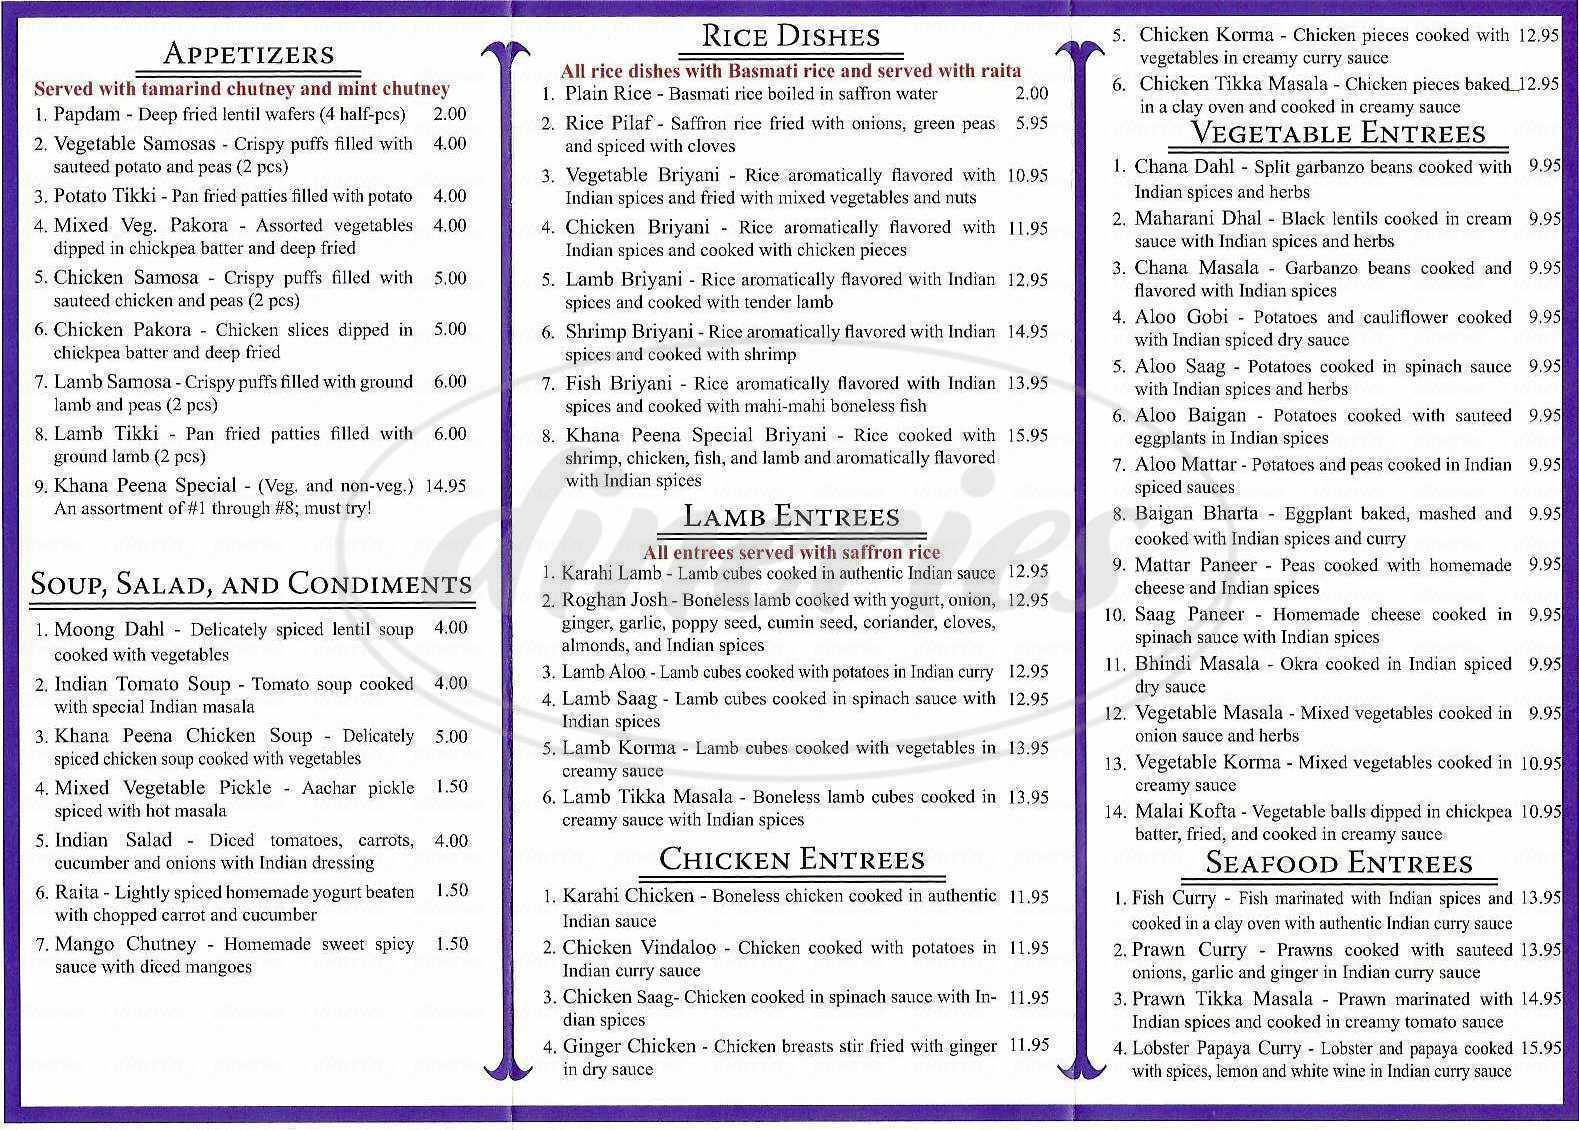 menu for Khana Peena